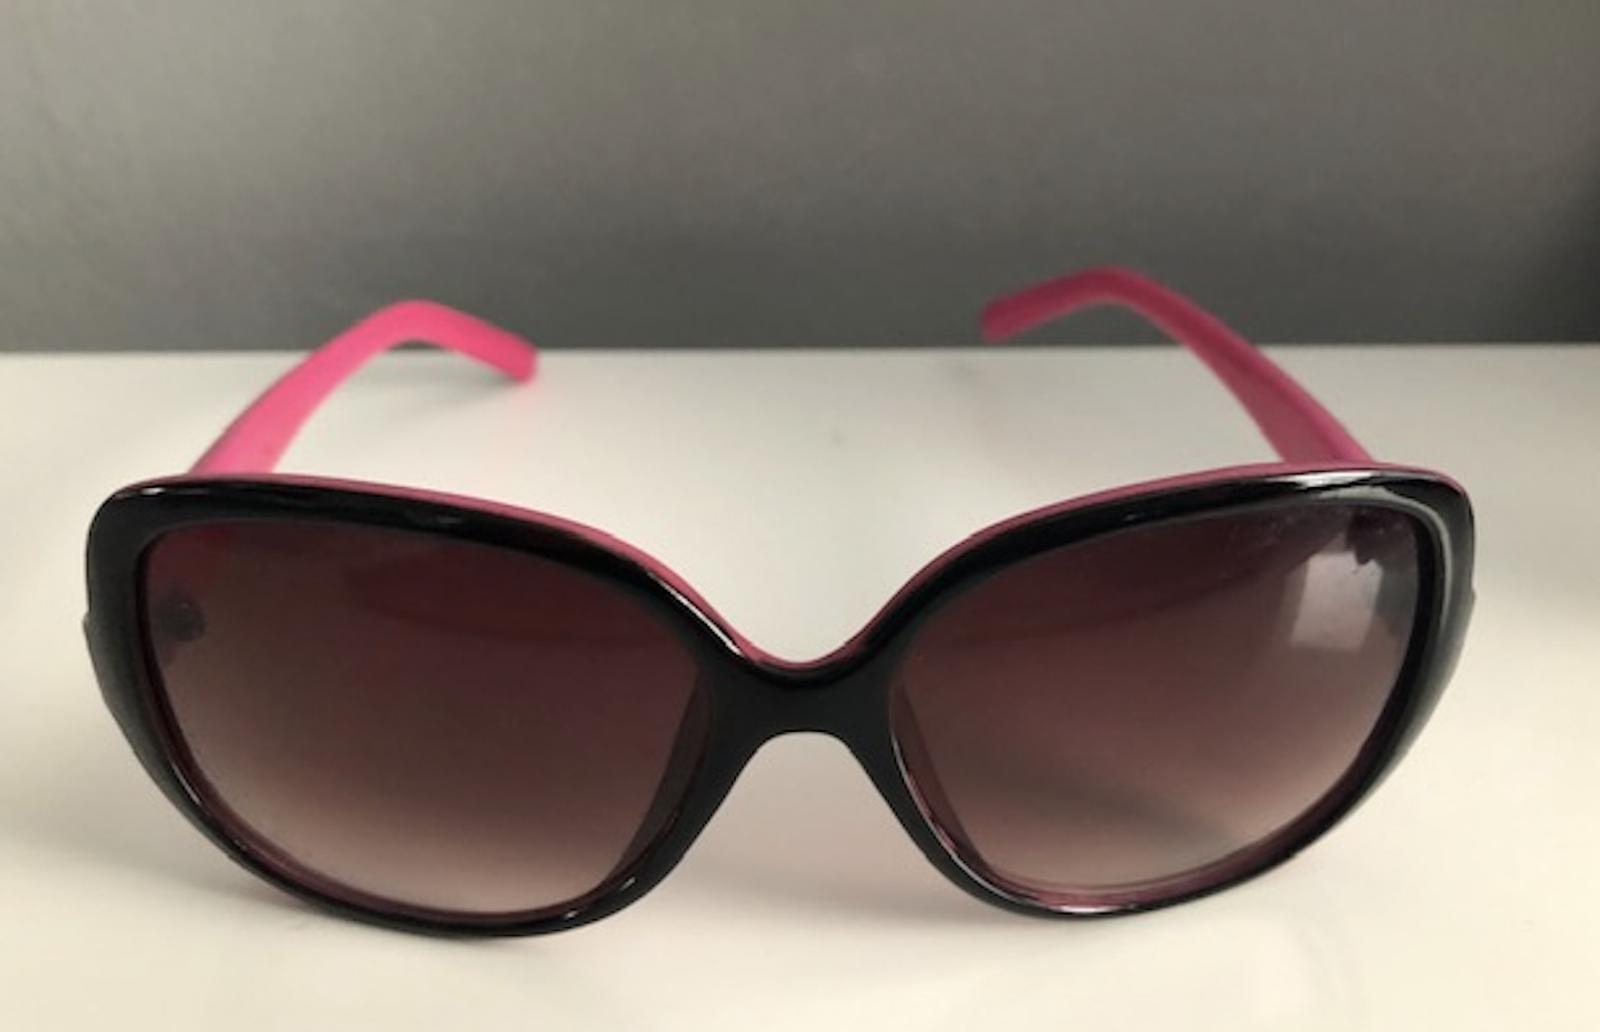 100% Authentic JUICY COUTURE Sunglasses (Women's) (Excellent Condition)